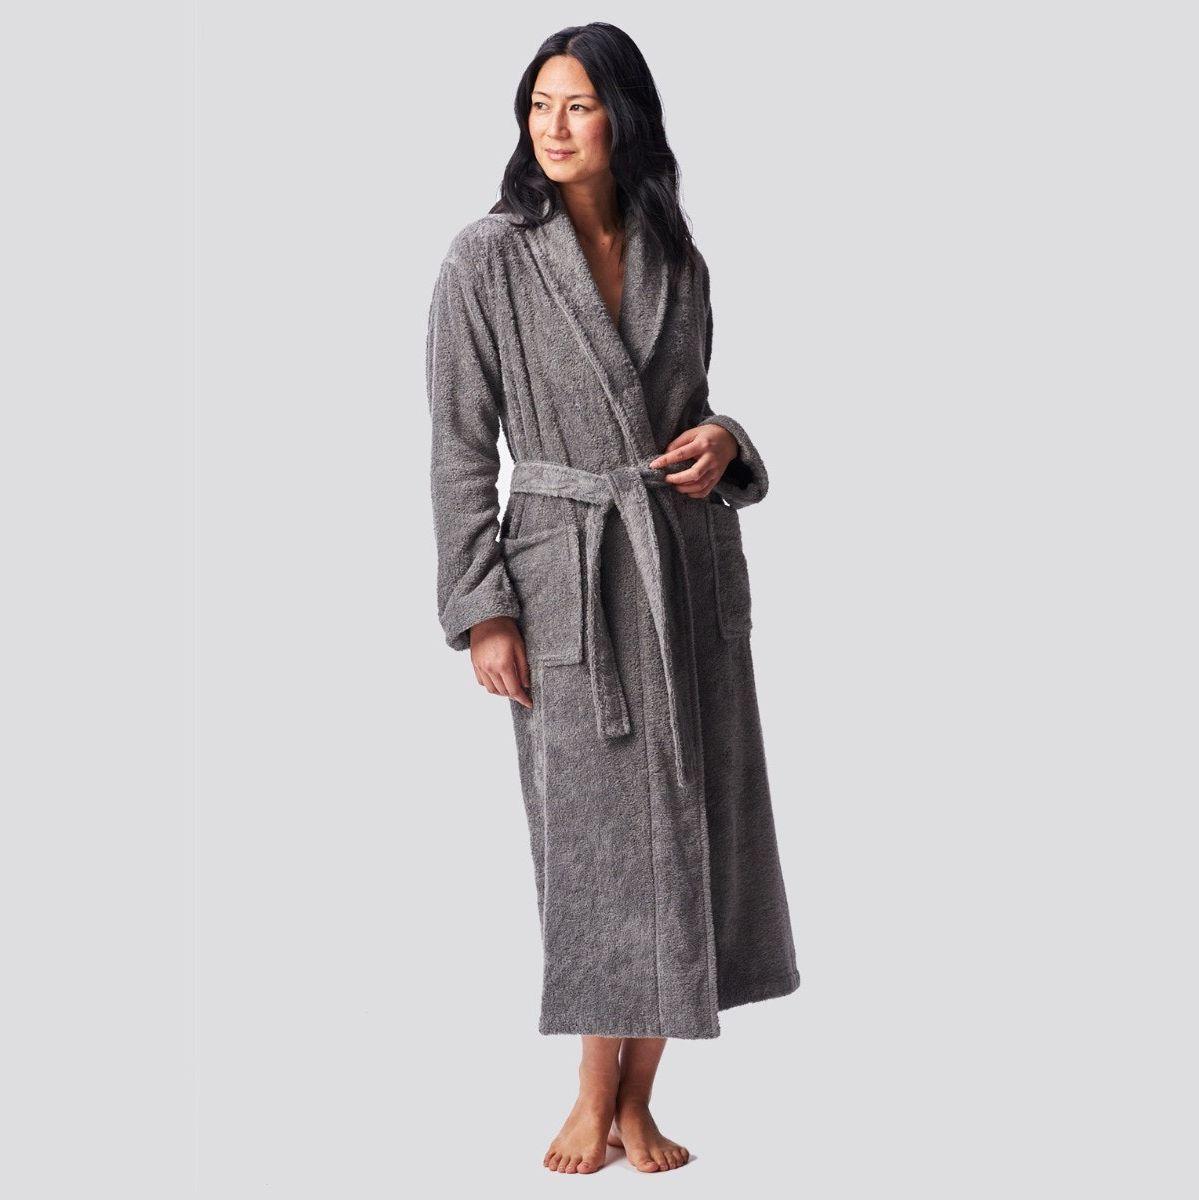 Mens 100/% Cotton Bath Towel Dressing Gown Lightweight Towelling Holiday Spa Gym Towel Bath Robe Soft and Cozy Men Knee-Length Hooded Bathrobe